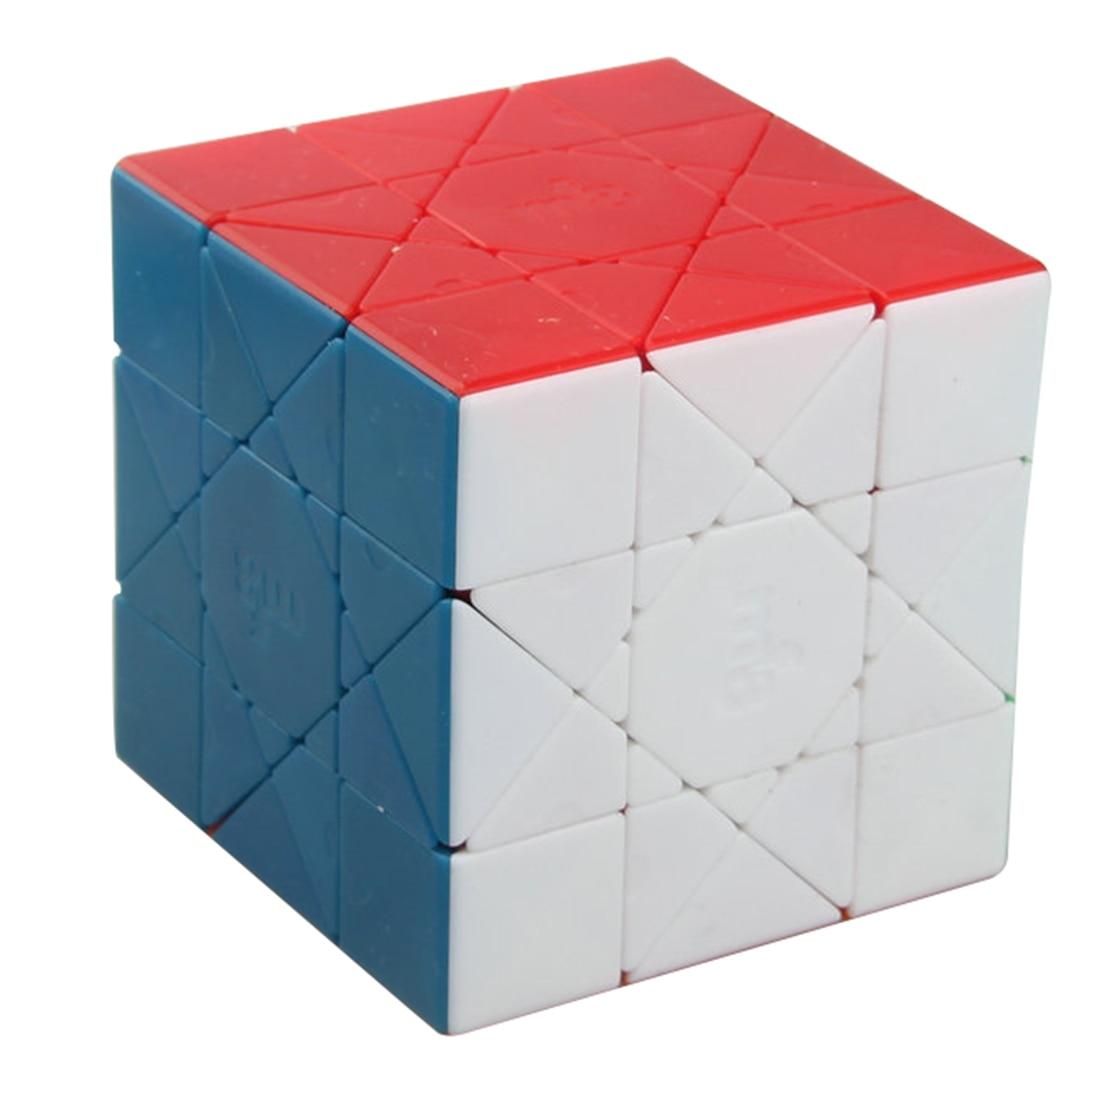 MF8 Sun Cube Brain Teaser Legend 3x3x3 Magic Cube Puzzle Toy - Colorful